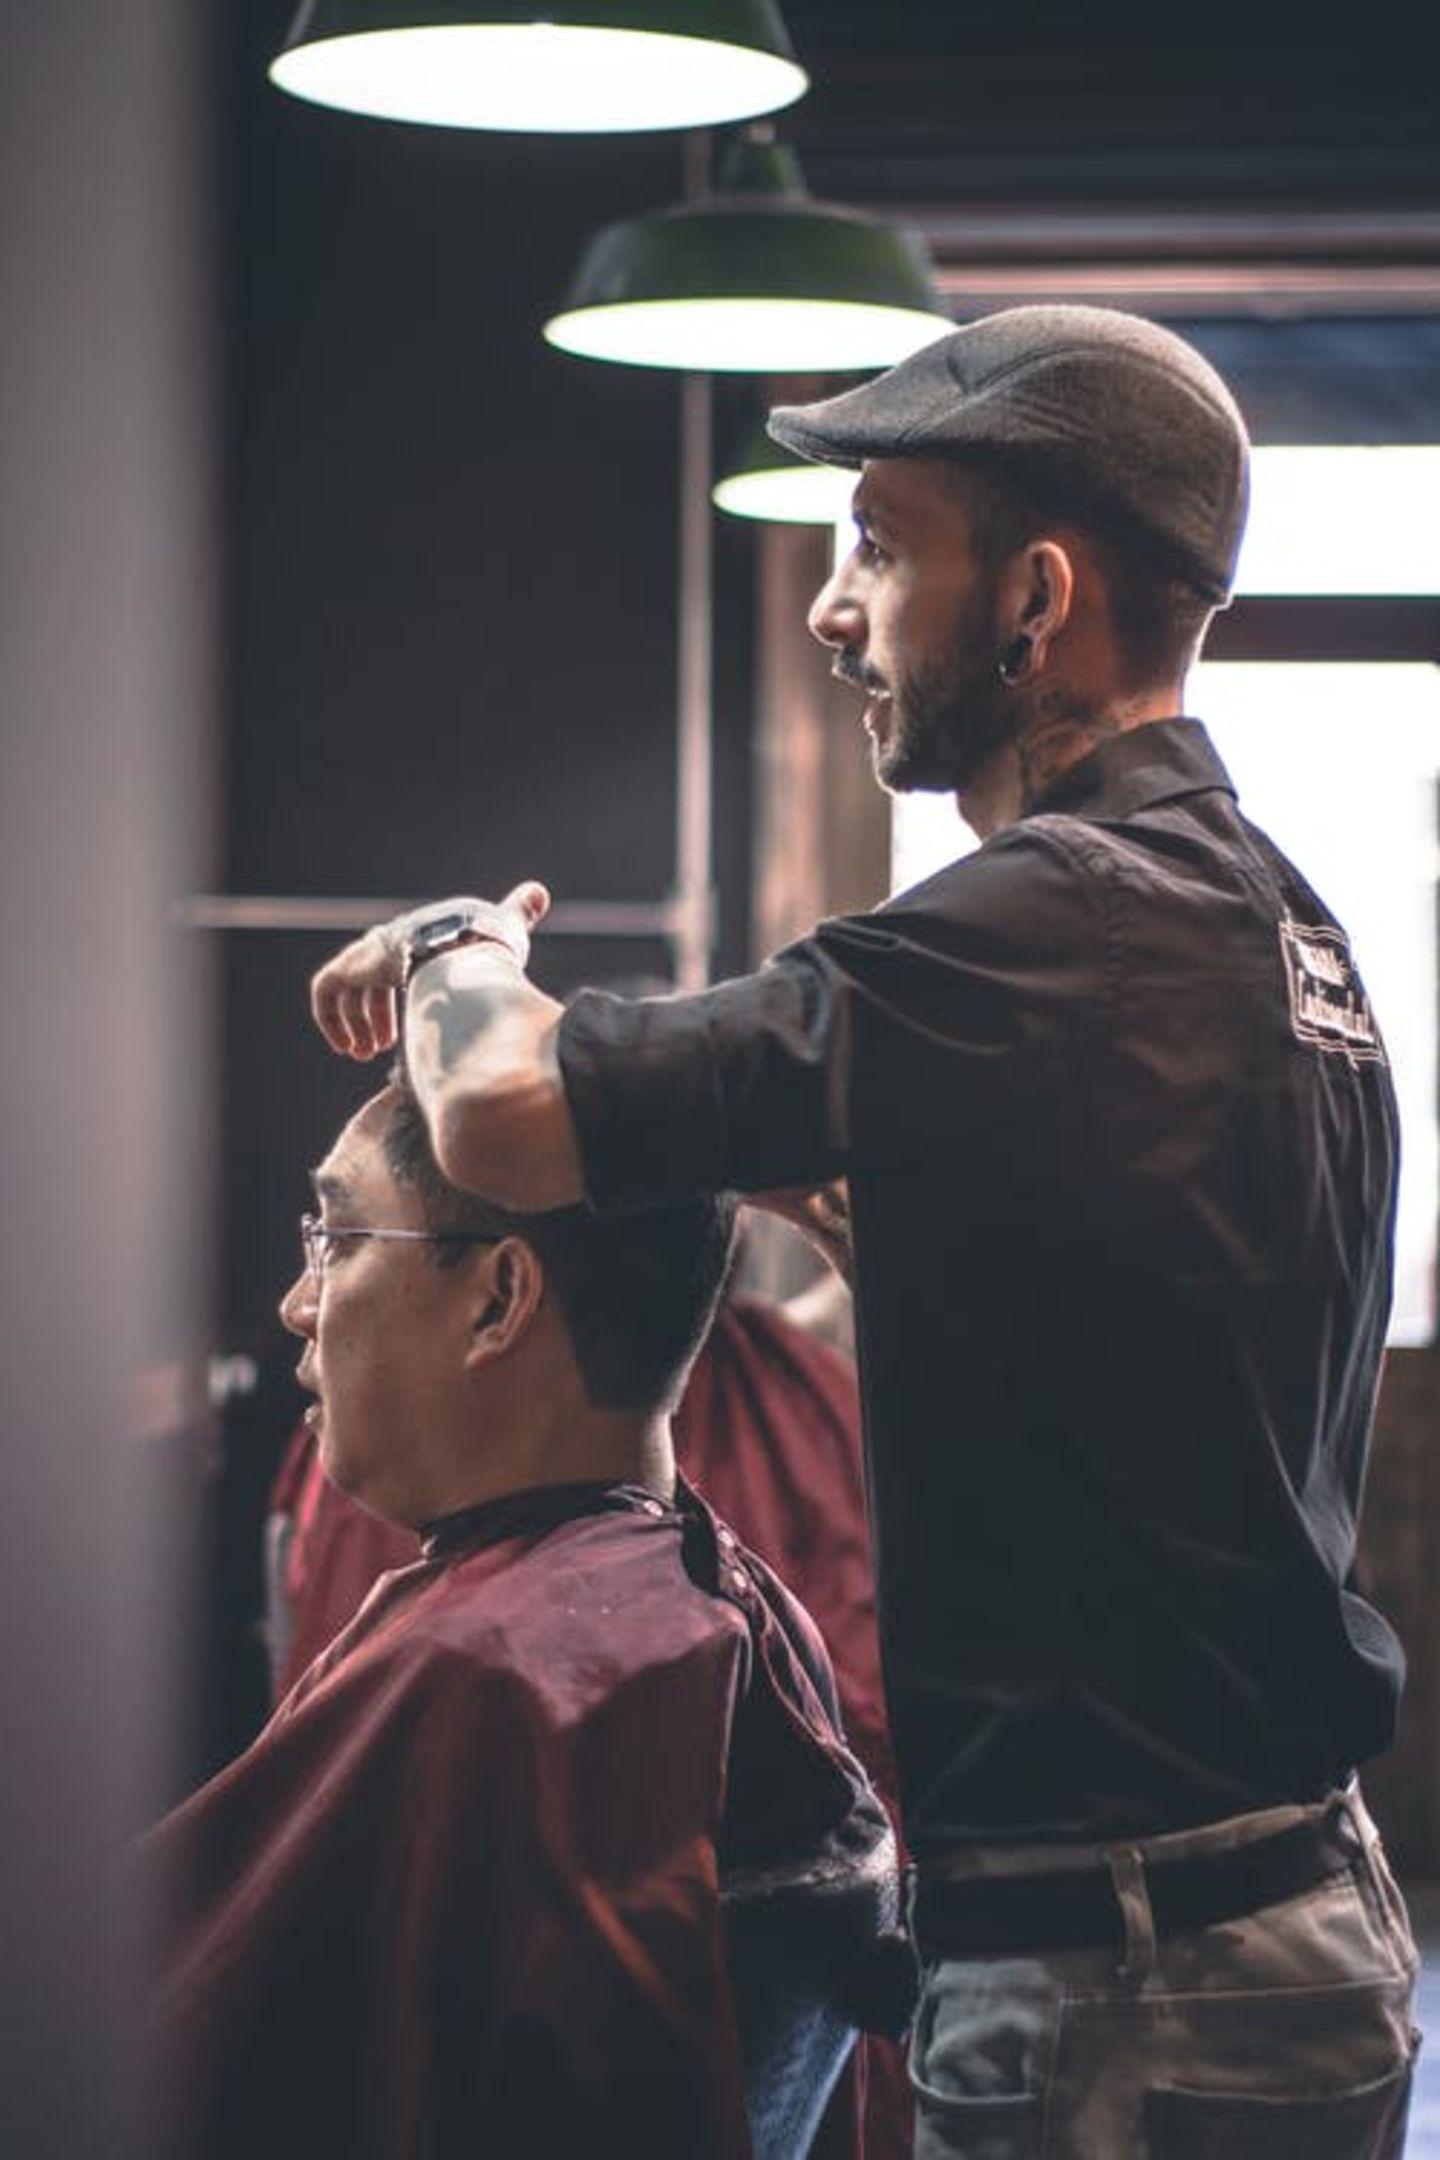 HiDubai-business-al-wasat-gents-saloon-beauty-wellness-health-beauty-salons-al-nahda-2-dubai